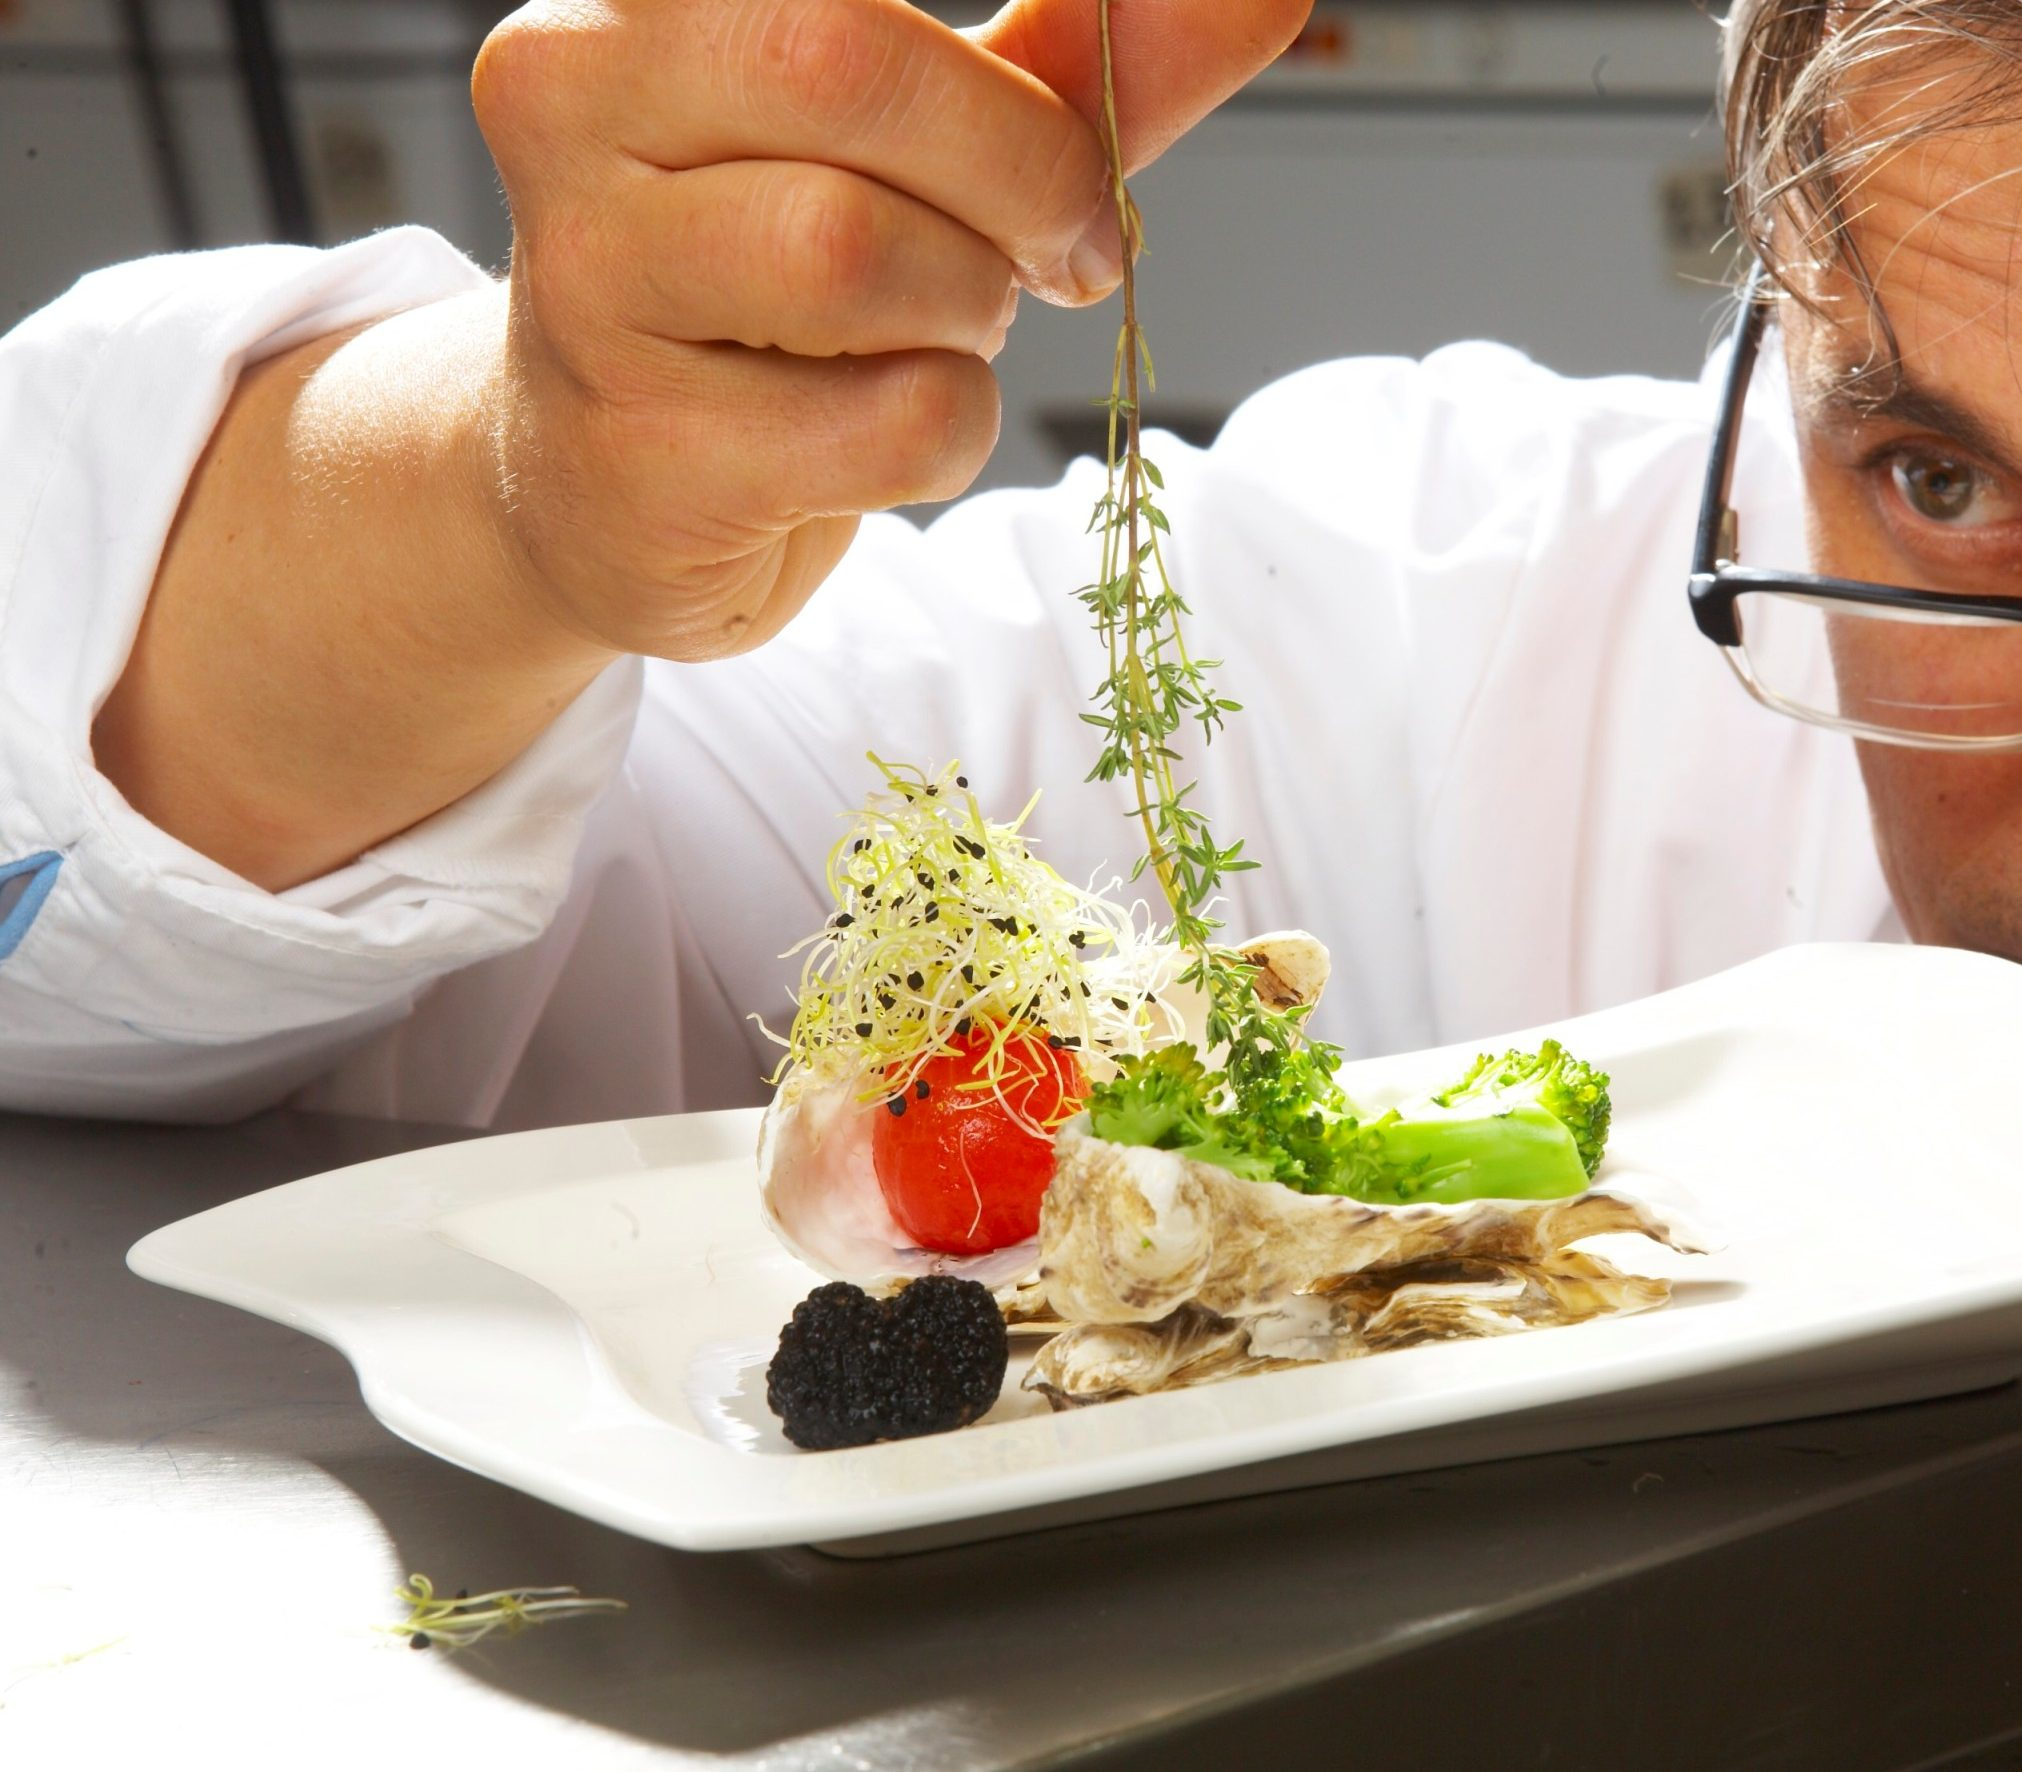 cucina con pochi euro - Cucina con pochi €uro